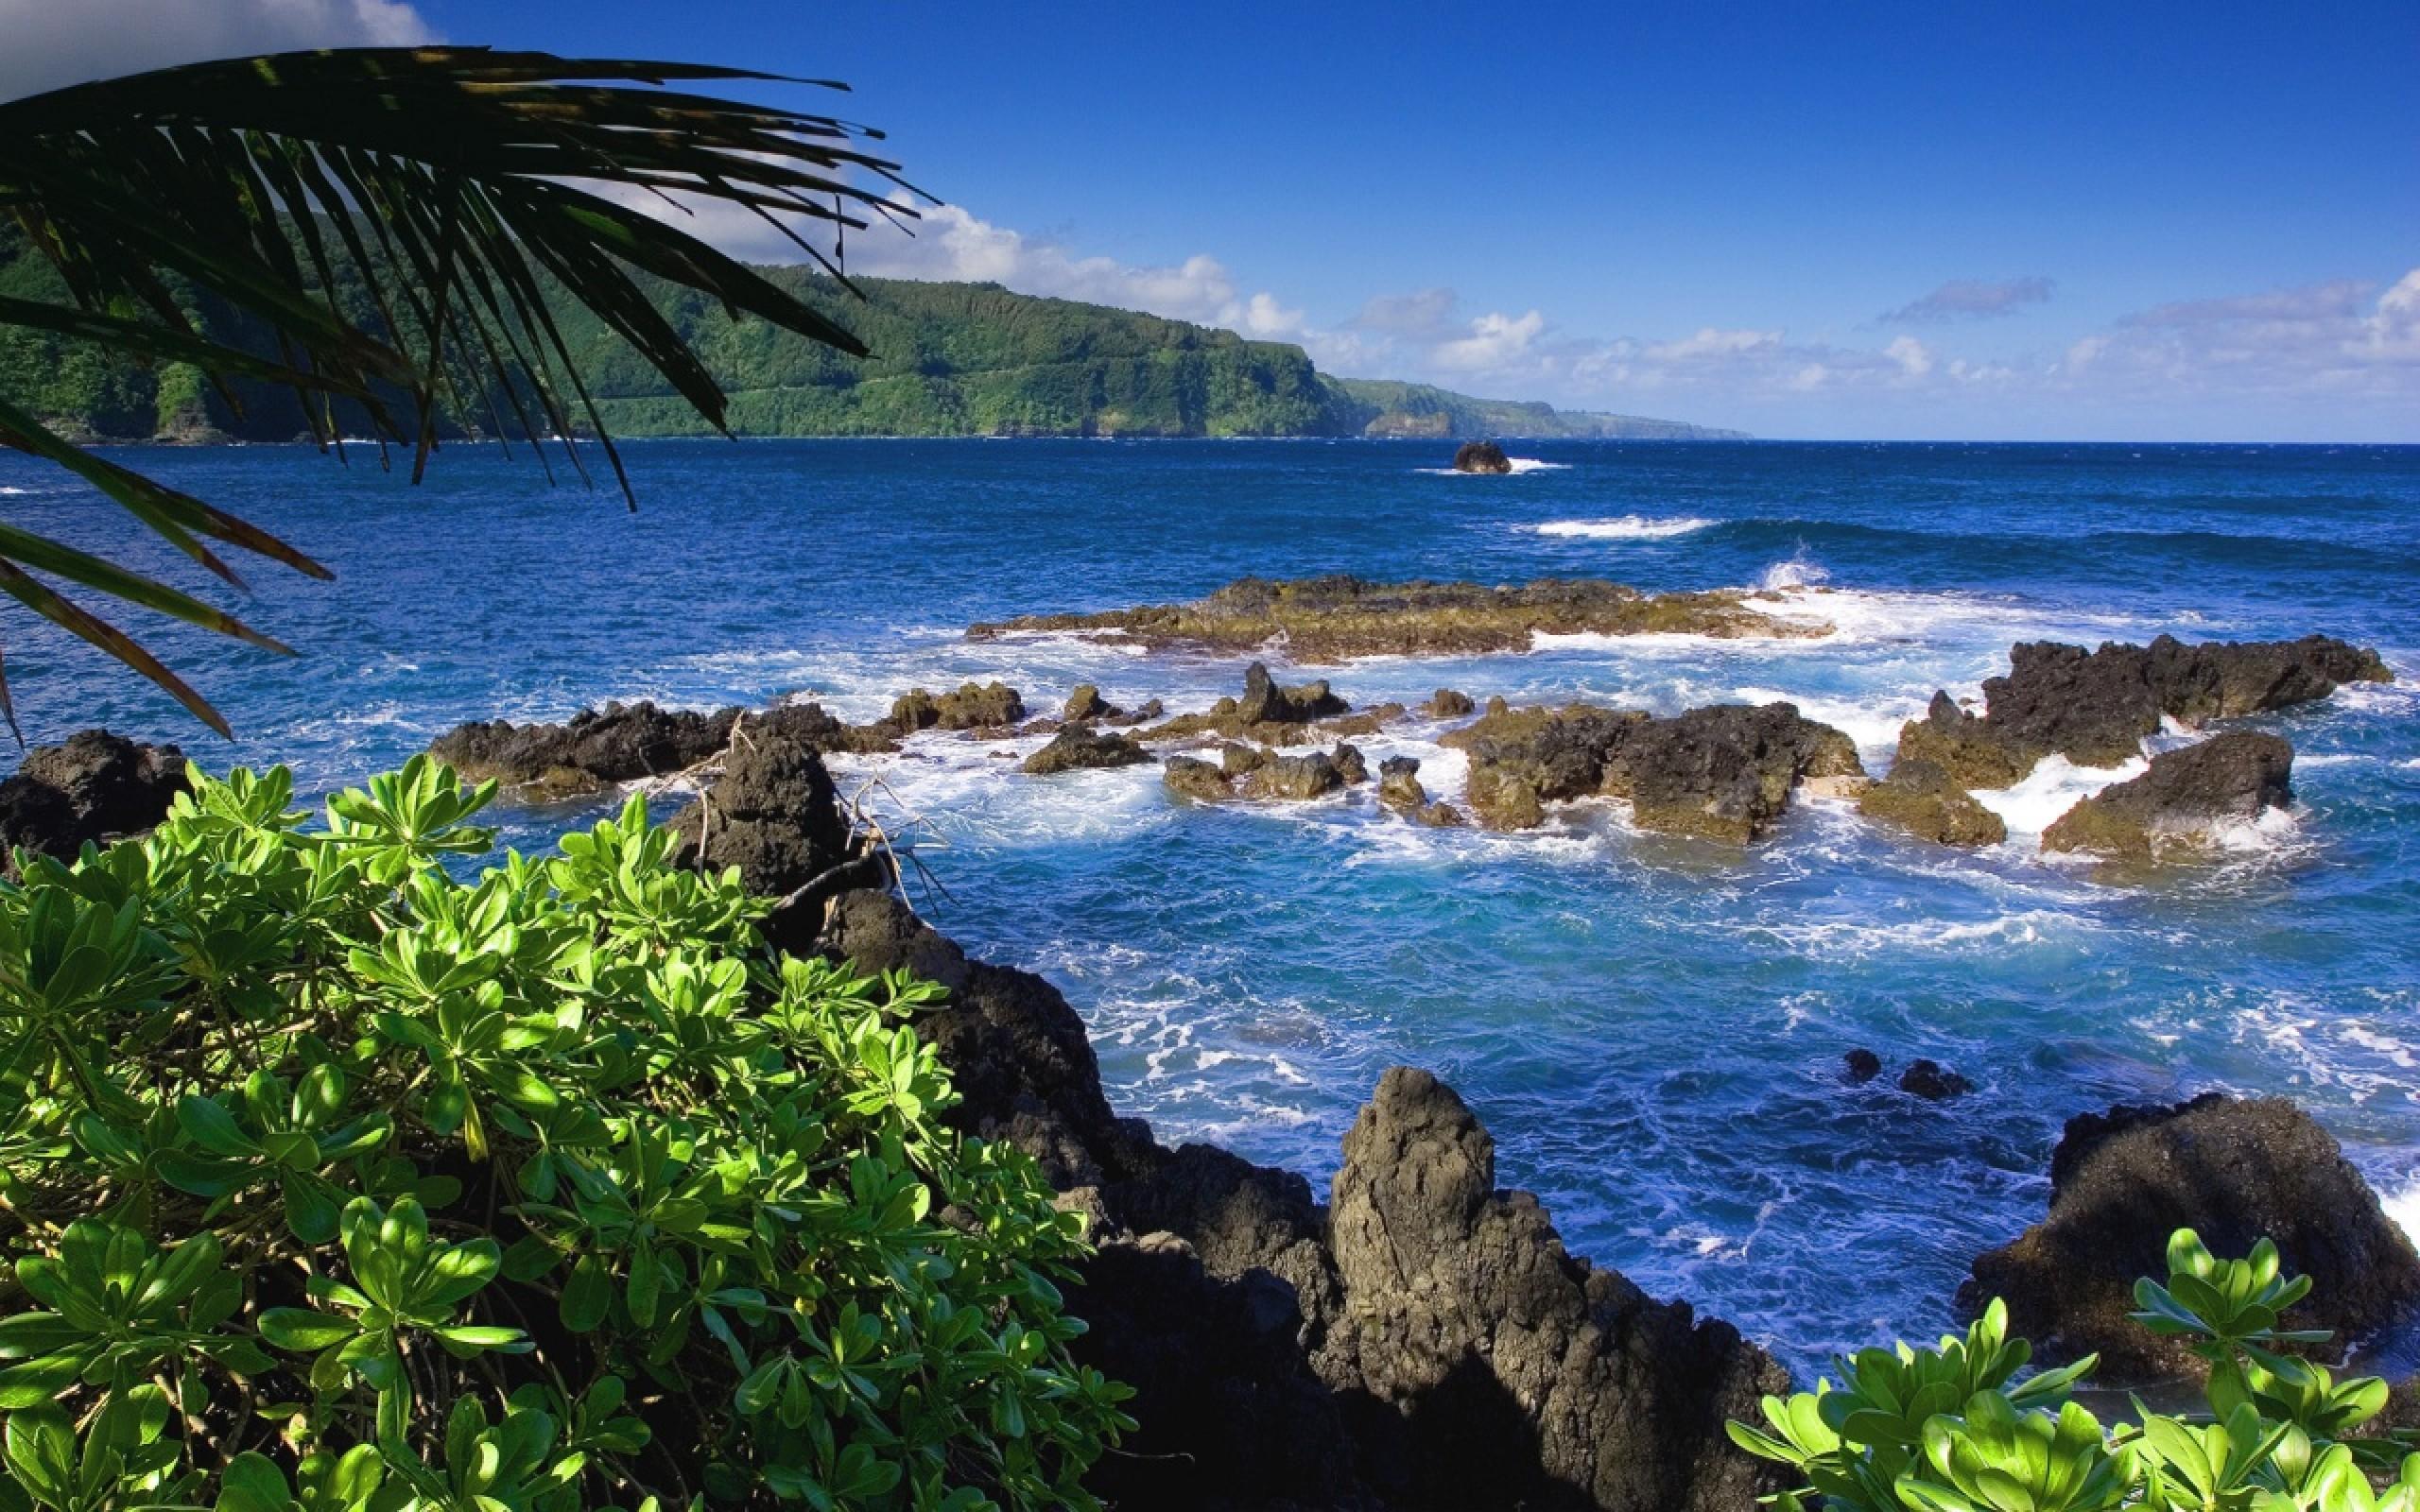 Hawaii Wallpaper 2560x1600